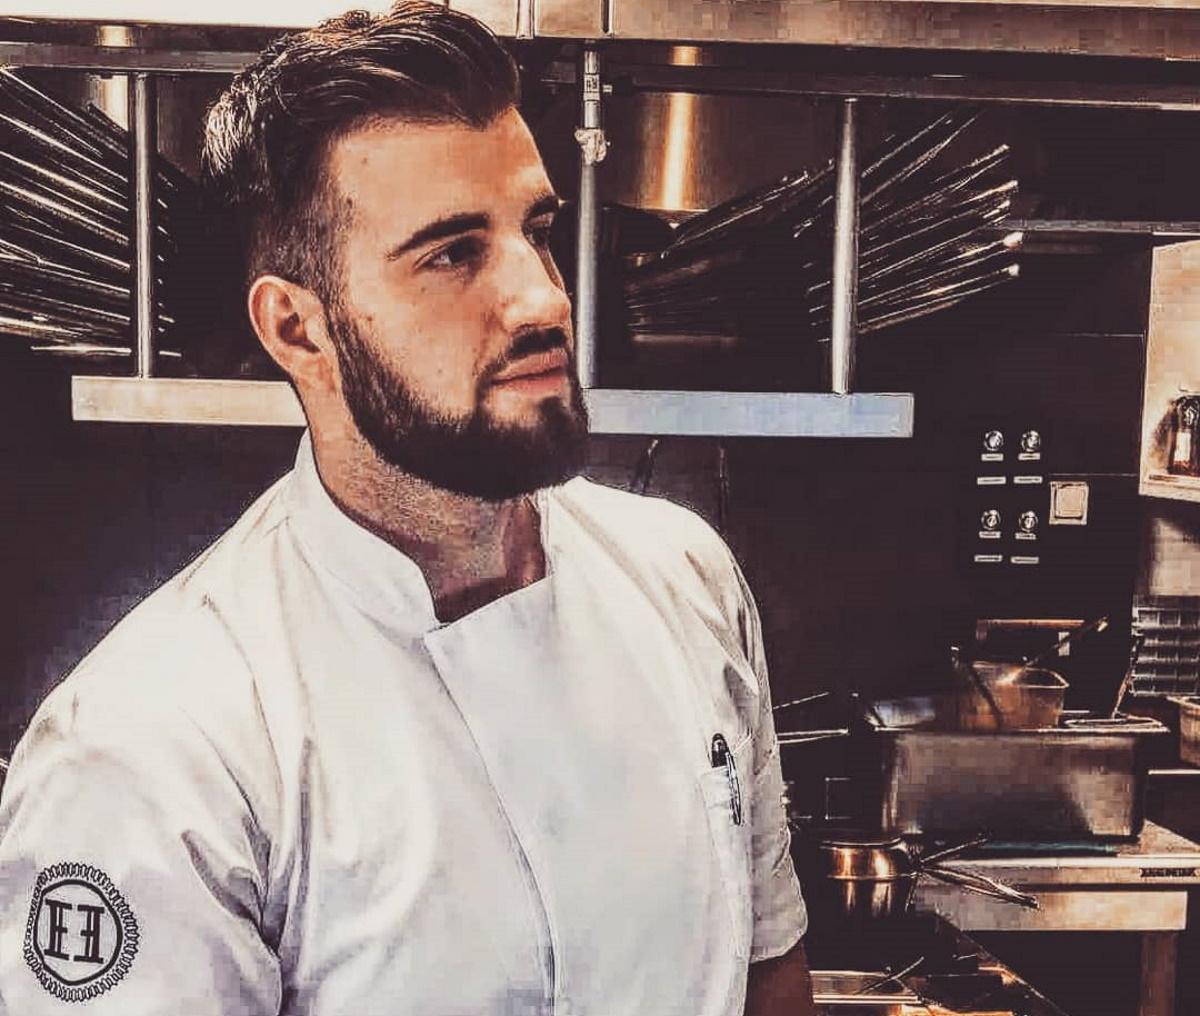 MasterChef: Ποιος είναι ο Σταύρος Βαρθαλίτης, ο μεγάλος νικητής του Διαγωνισμού Μαγειρικής! [pics,vid]